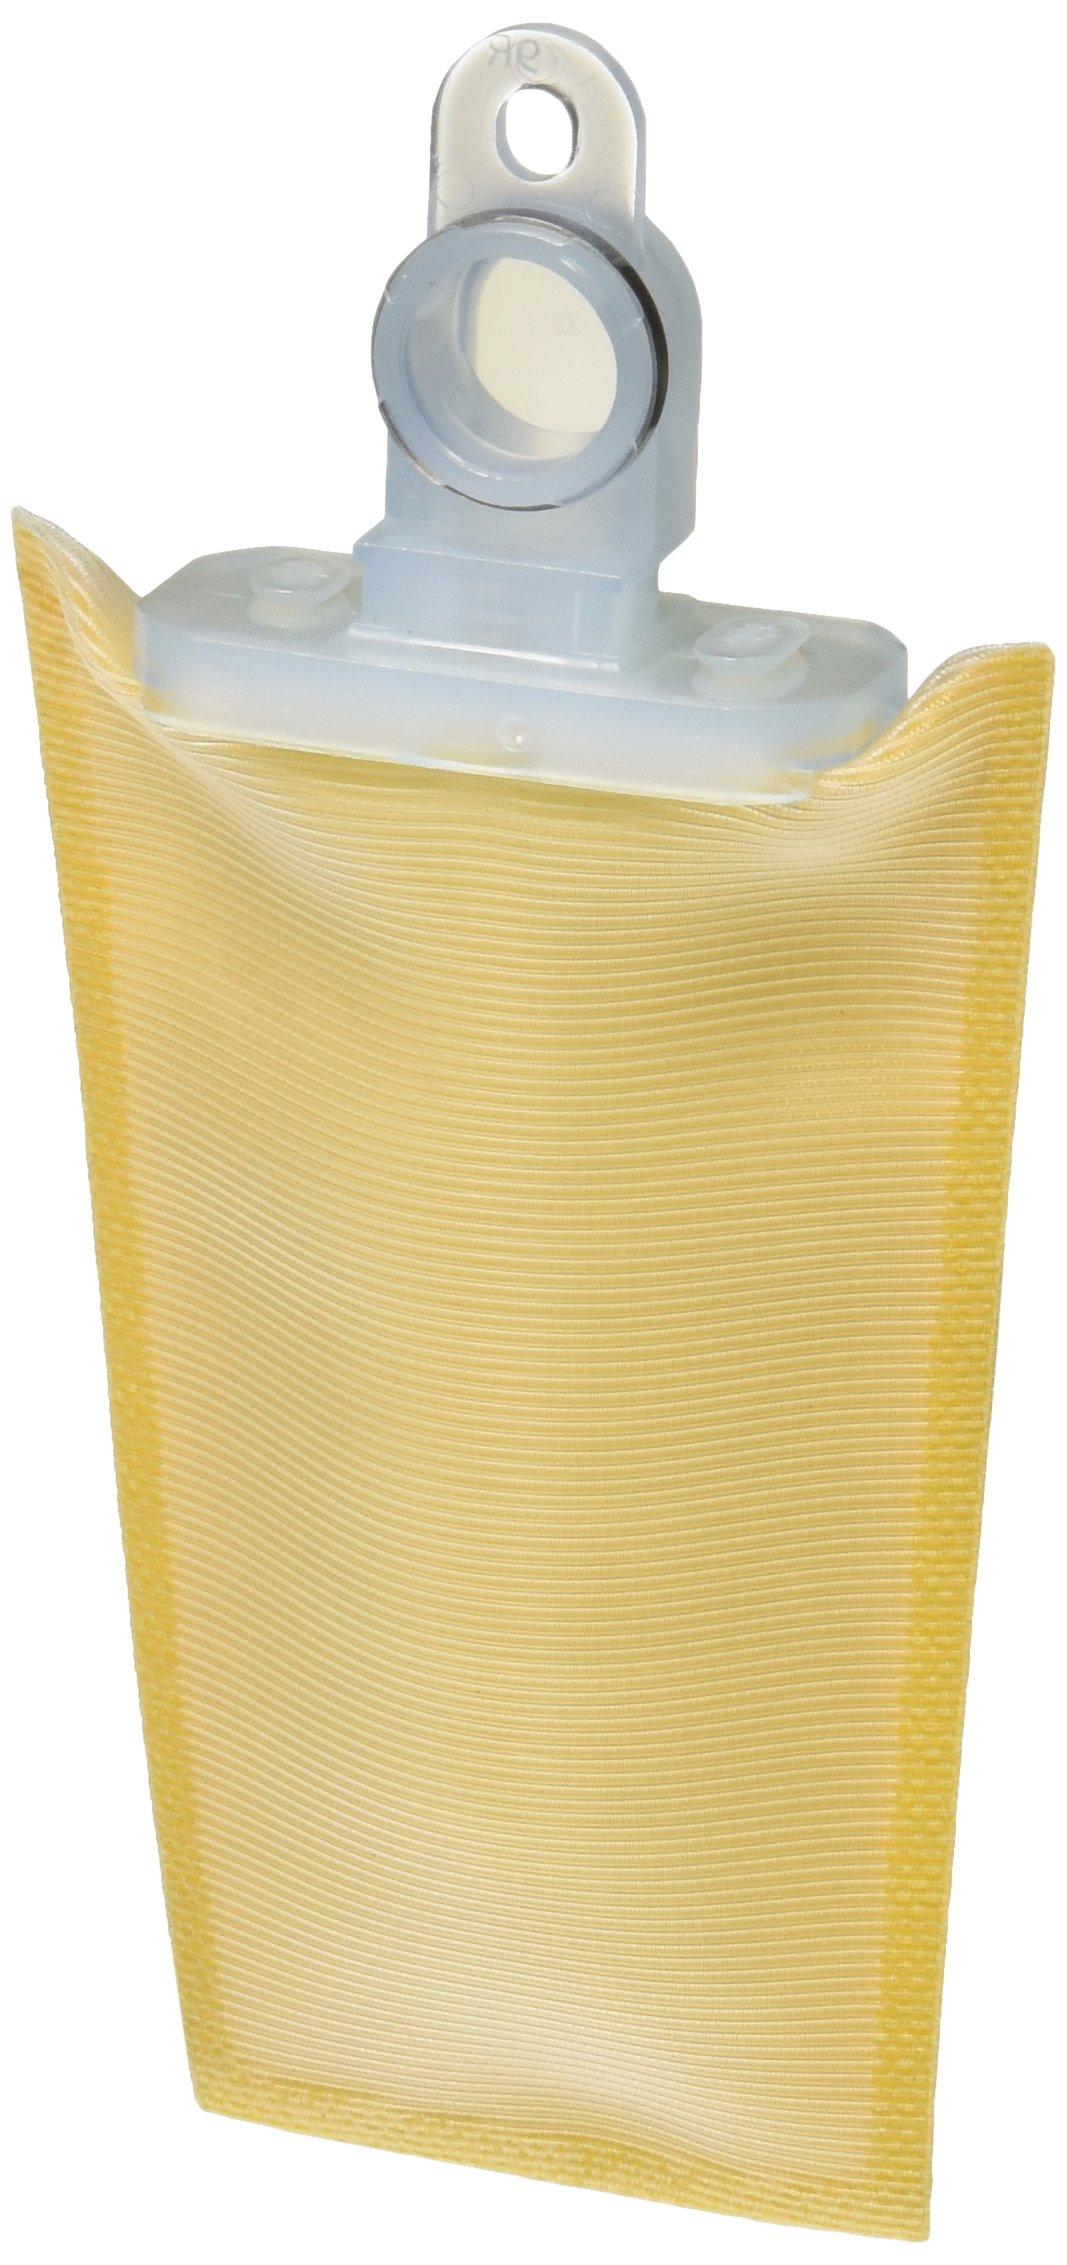 Denso 952-0006 Fuel Pump Filter